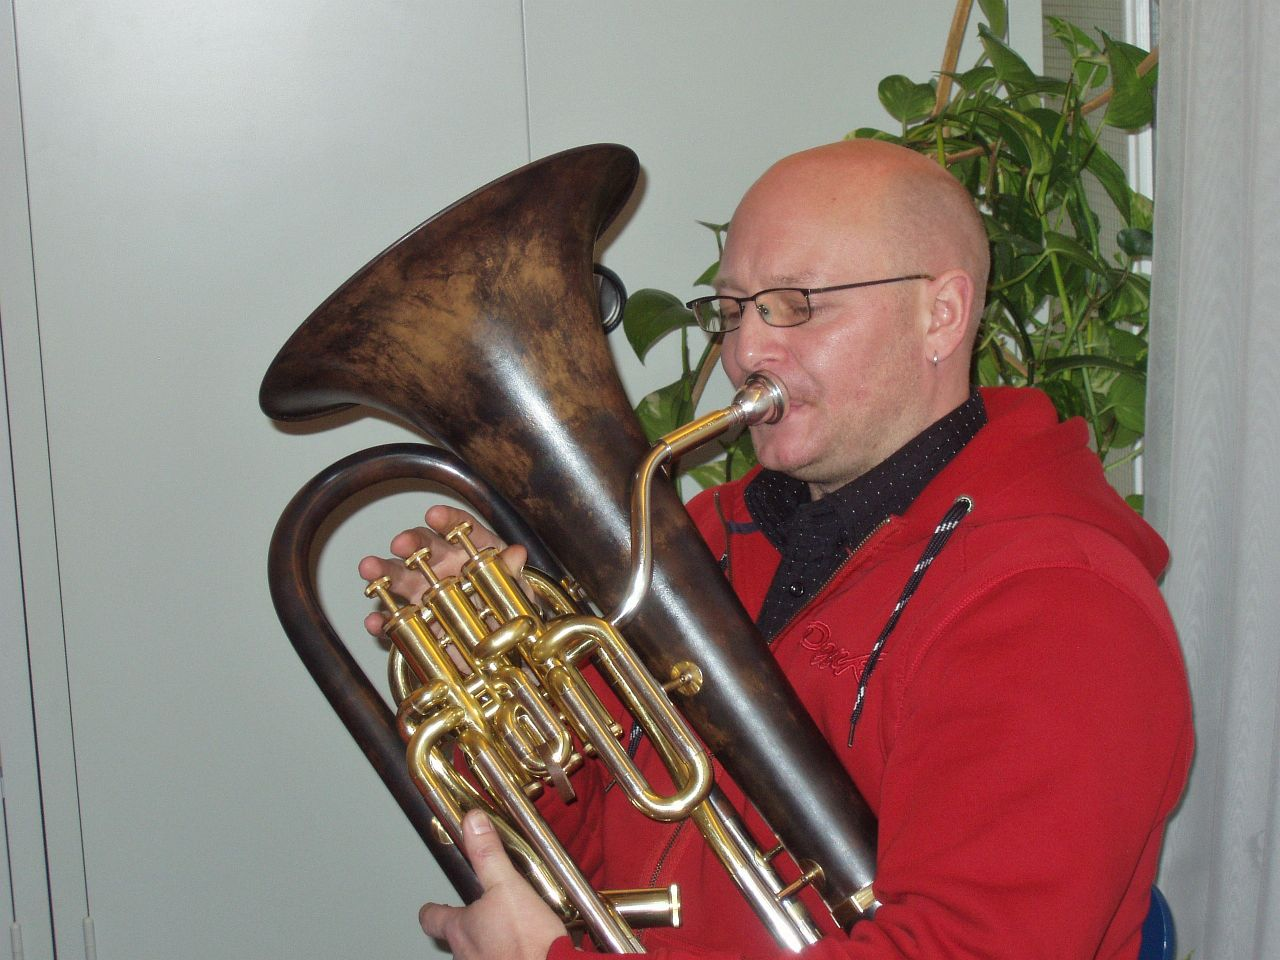 Musiker 316